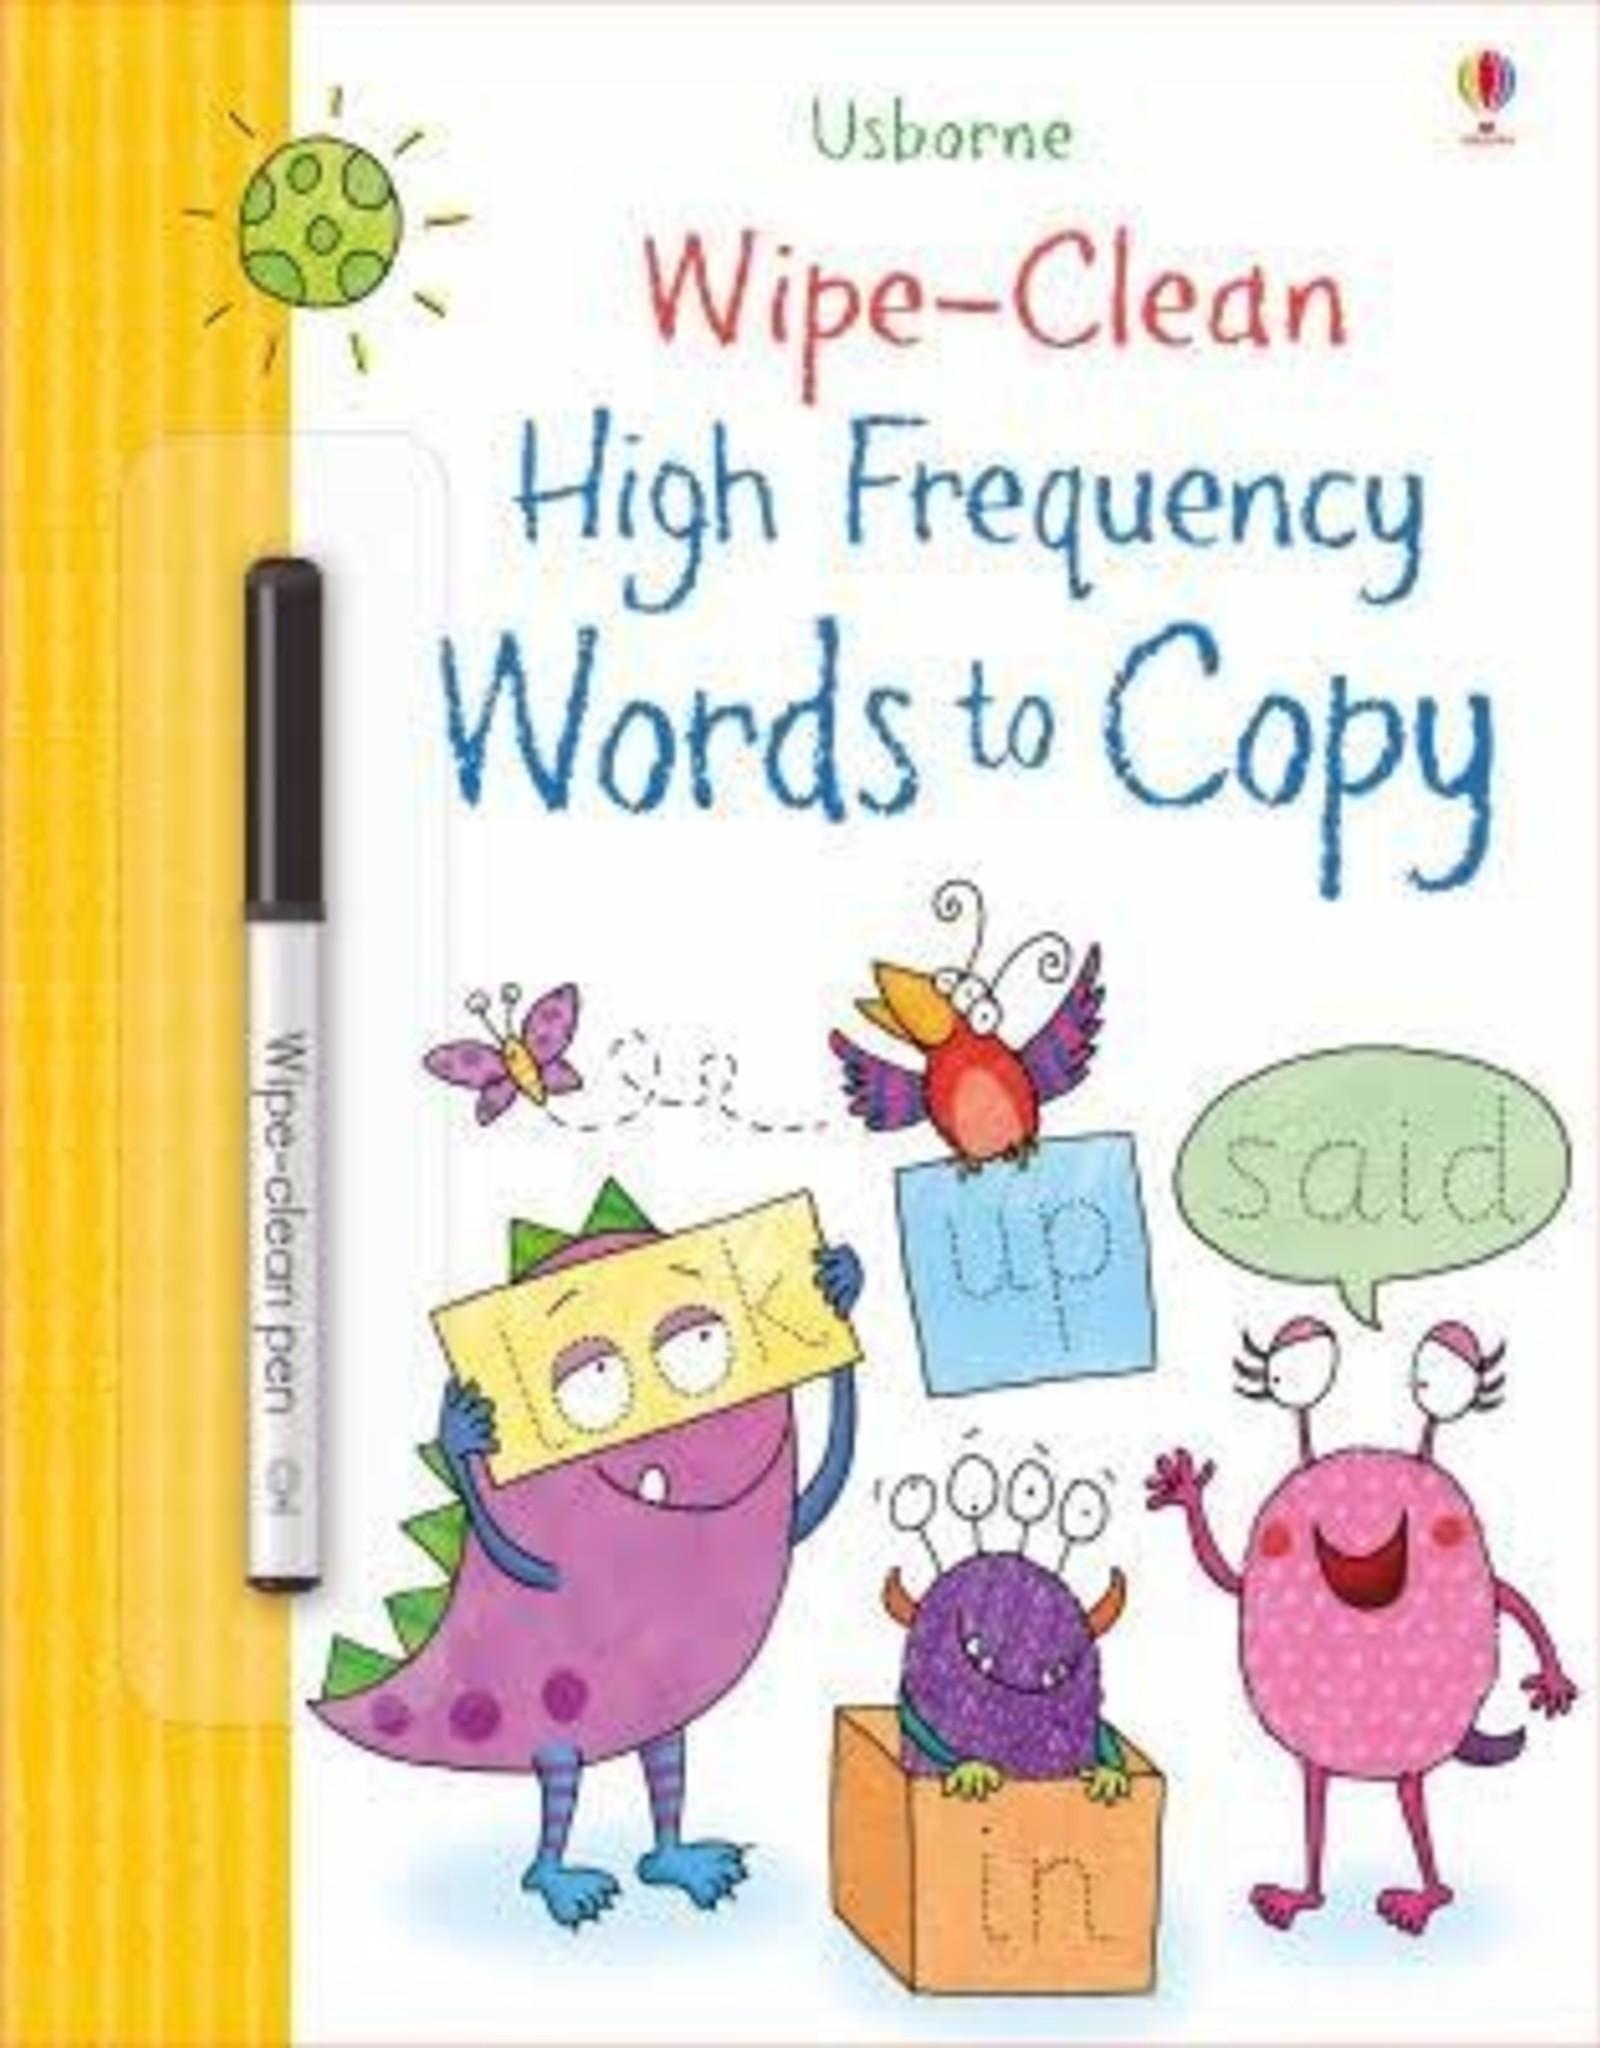 Usborne Usborne Wipe-Clean High Frequency Word to Copy